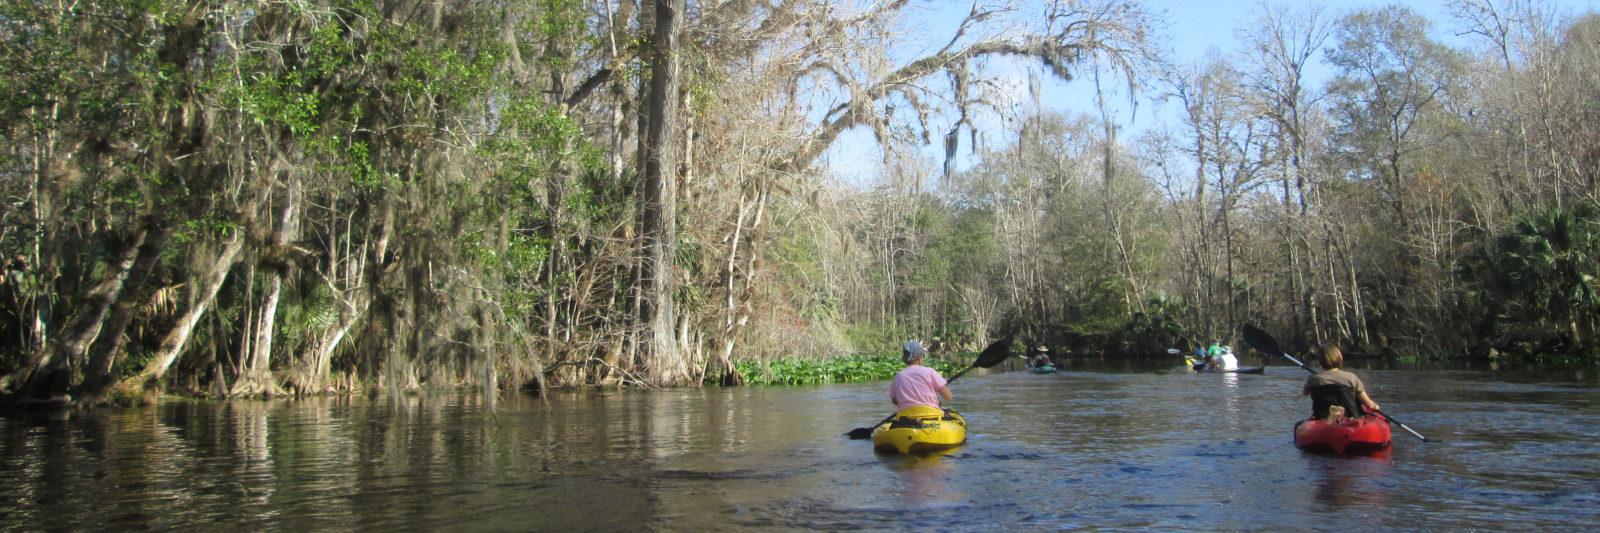 Paddling in Florida | Florida Hikes!